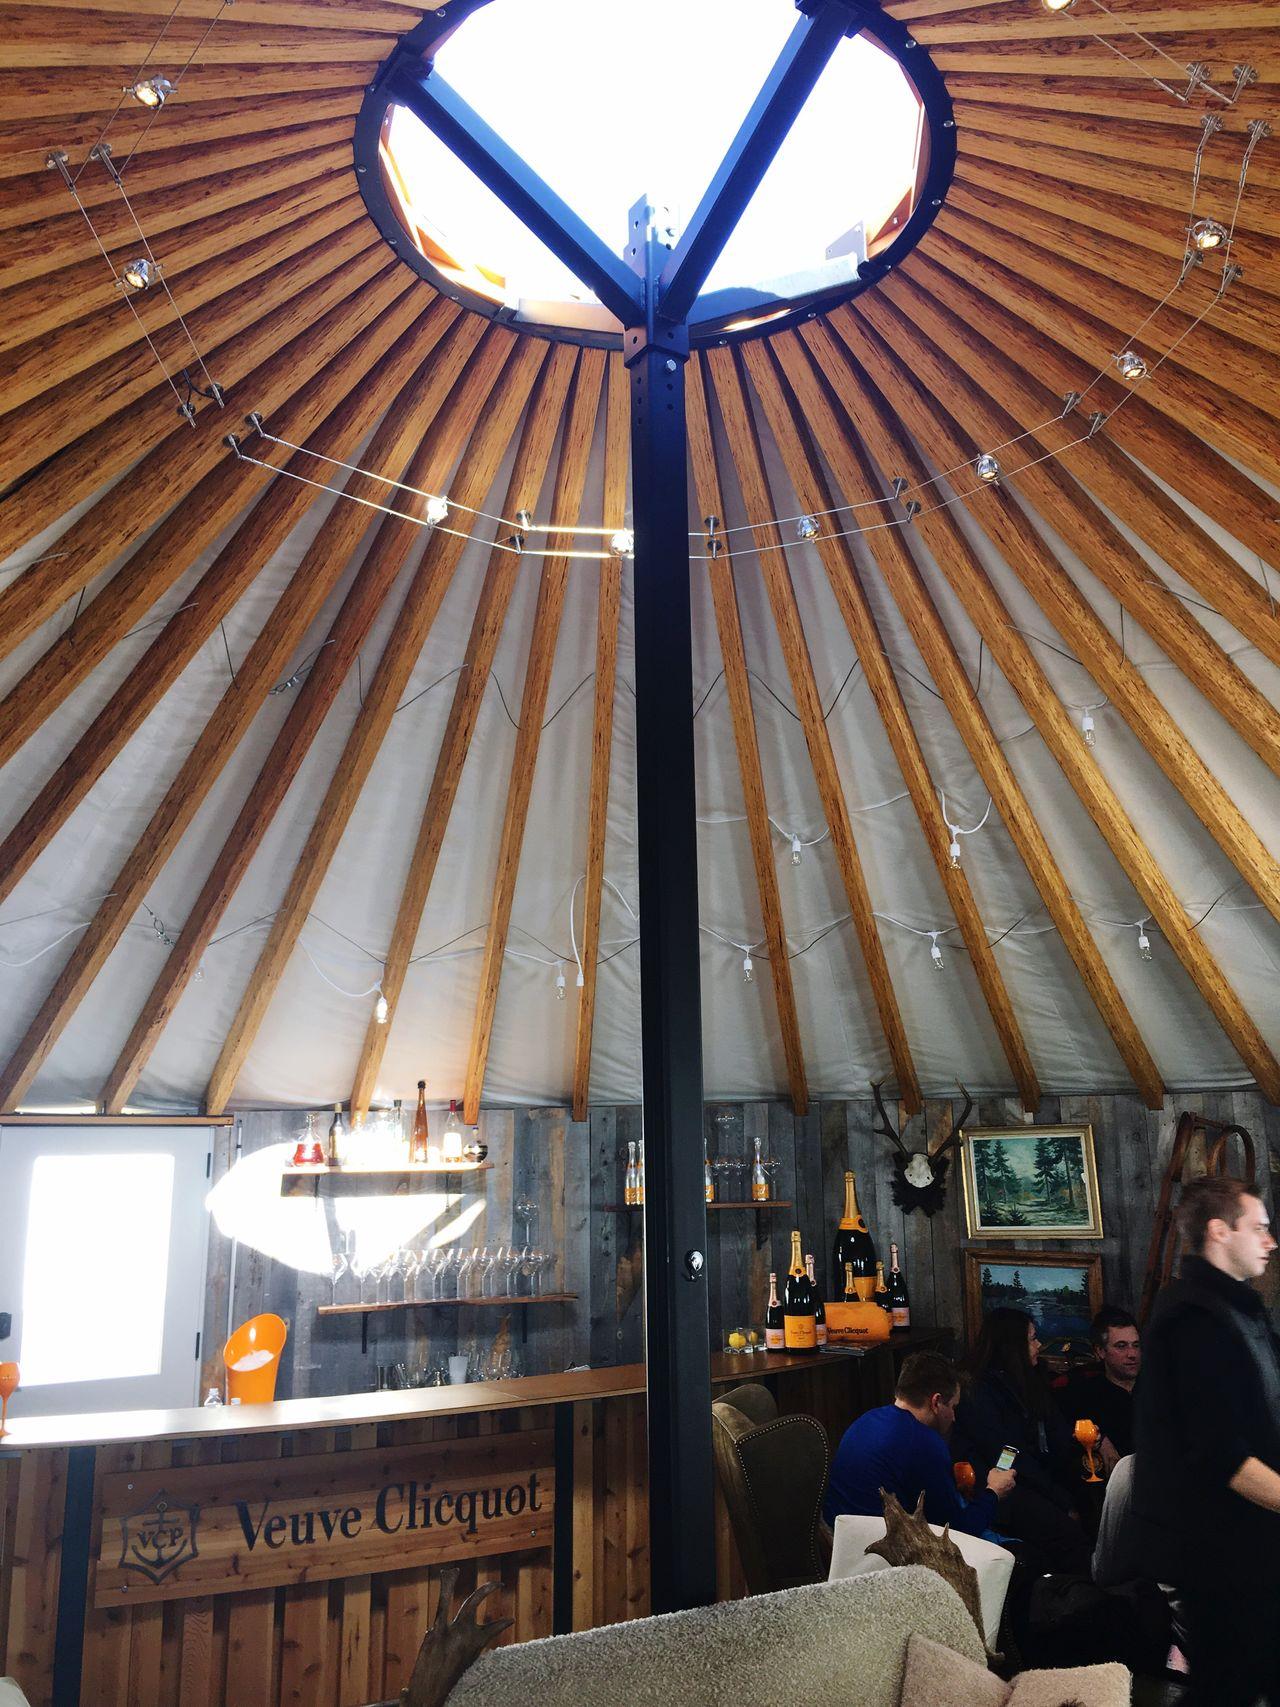 Luxe yurt Apres Ski Bar Champagne Built Structure Lifestyles Illuminated Architecture Day Luxe Rustic Yurt Skiresort Ambiance Ski Yurt